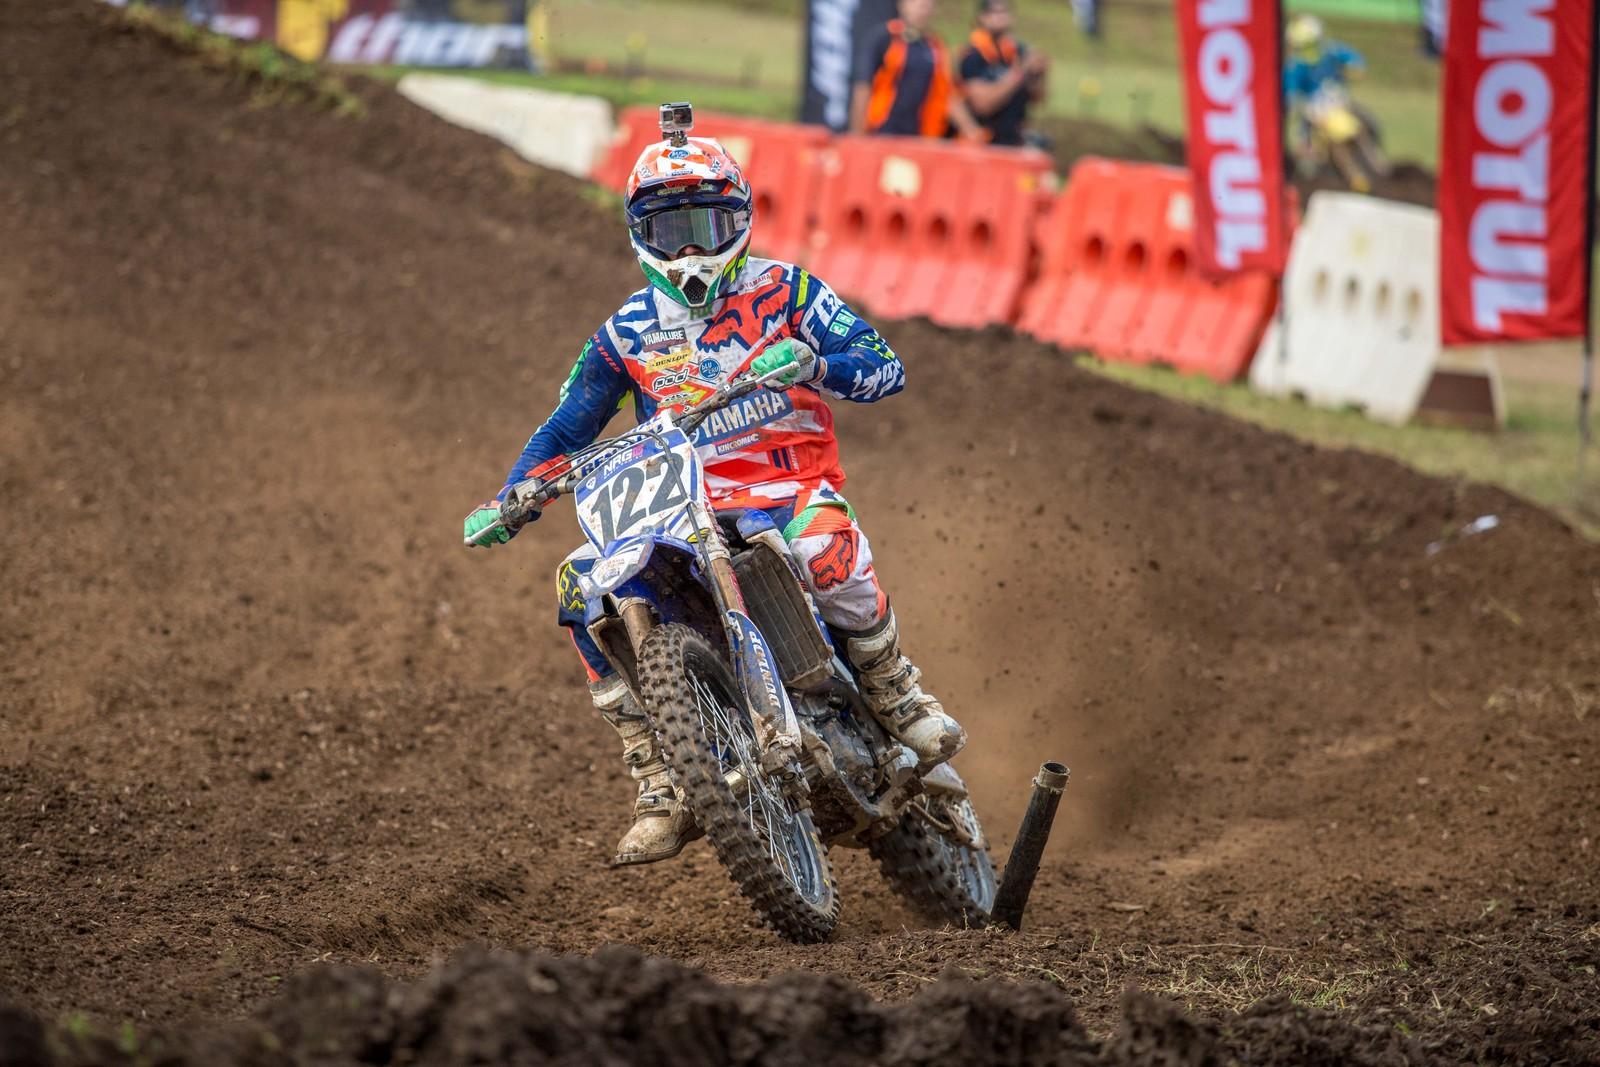 Dan Reardon - Australian Motul Motocross Nationals Round 2, Appin - Motocross Pictures - Vital MX